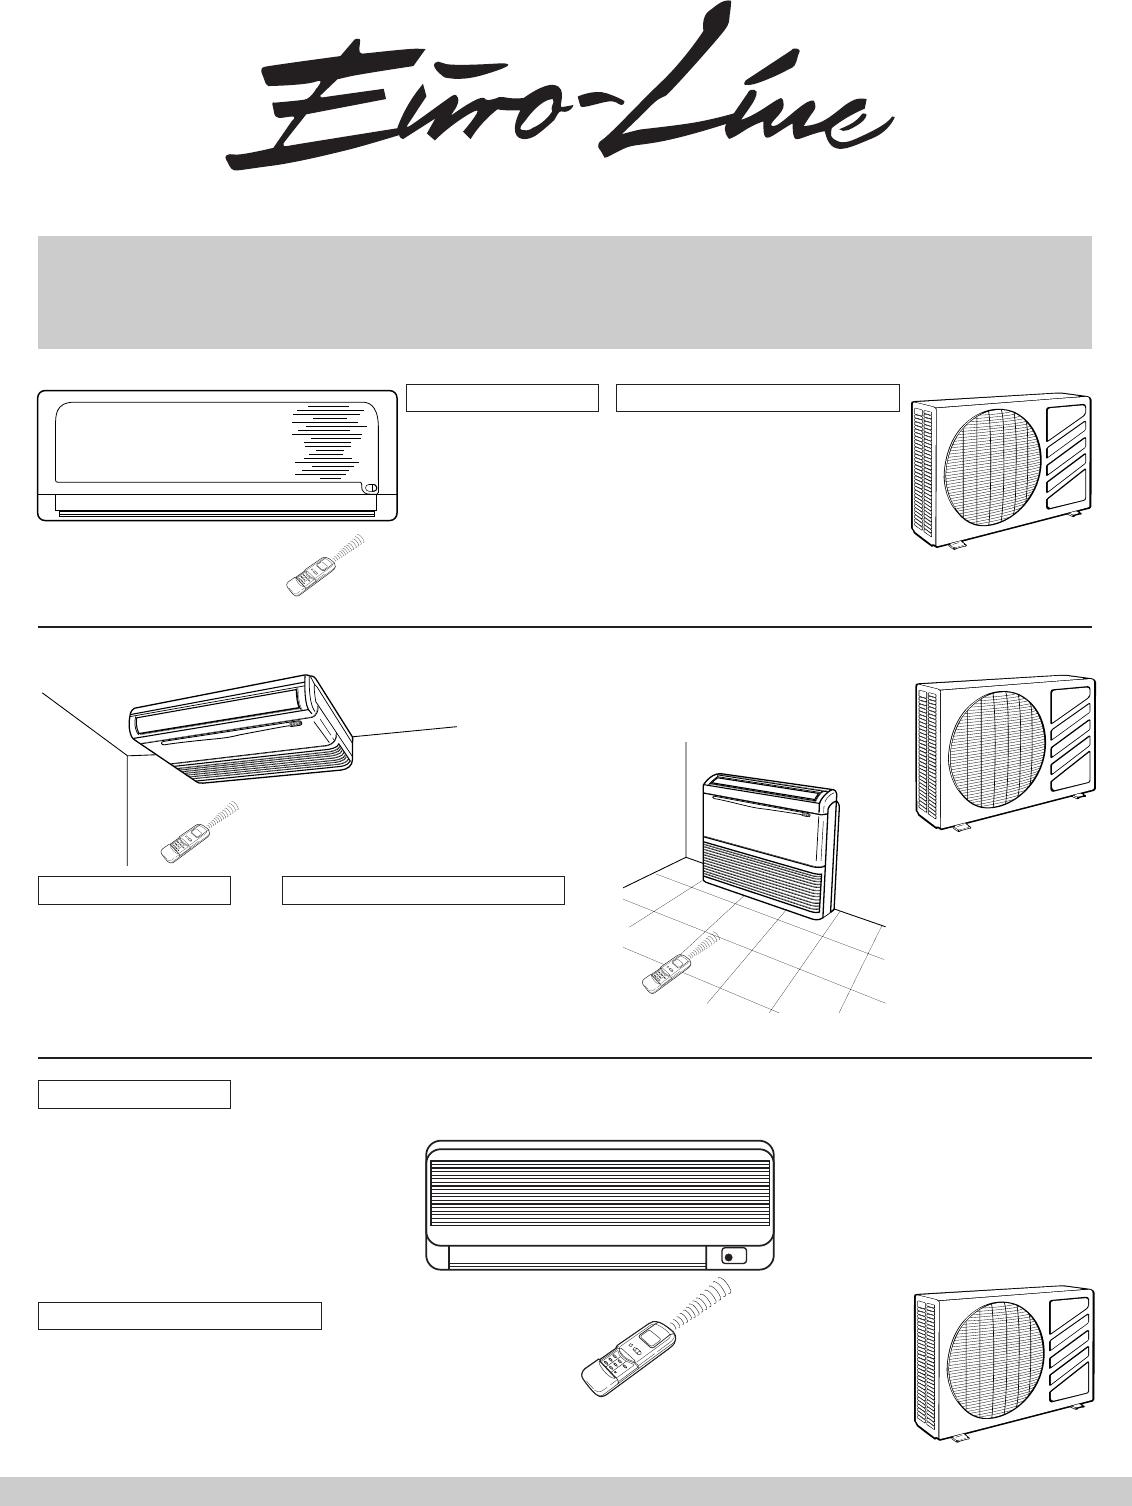 Euro-Line AWR318HLE manual